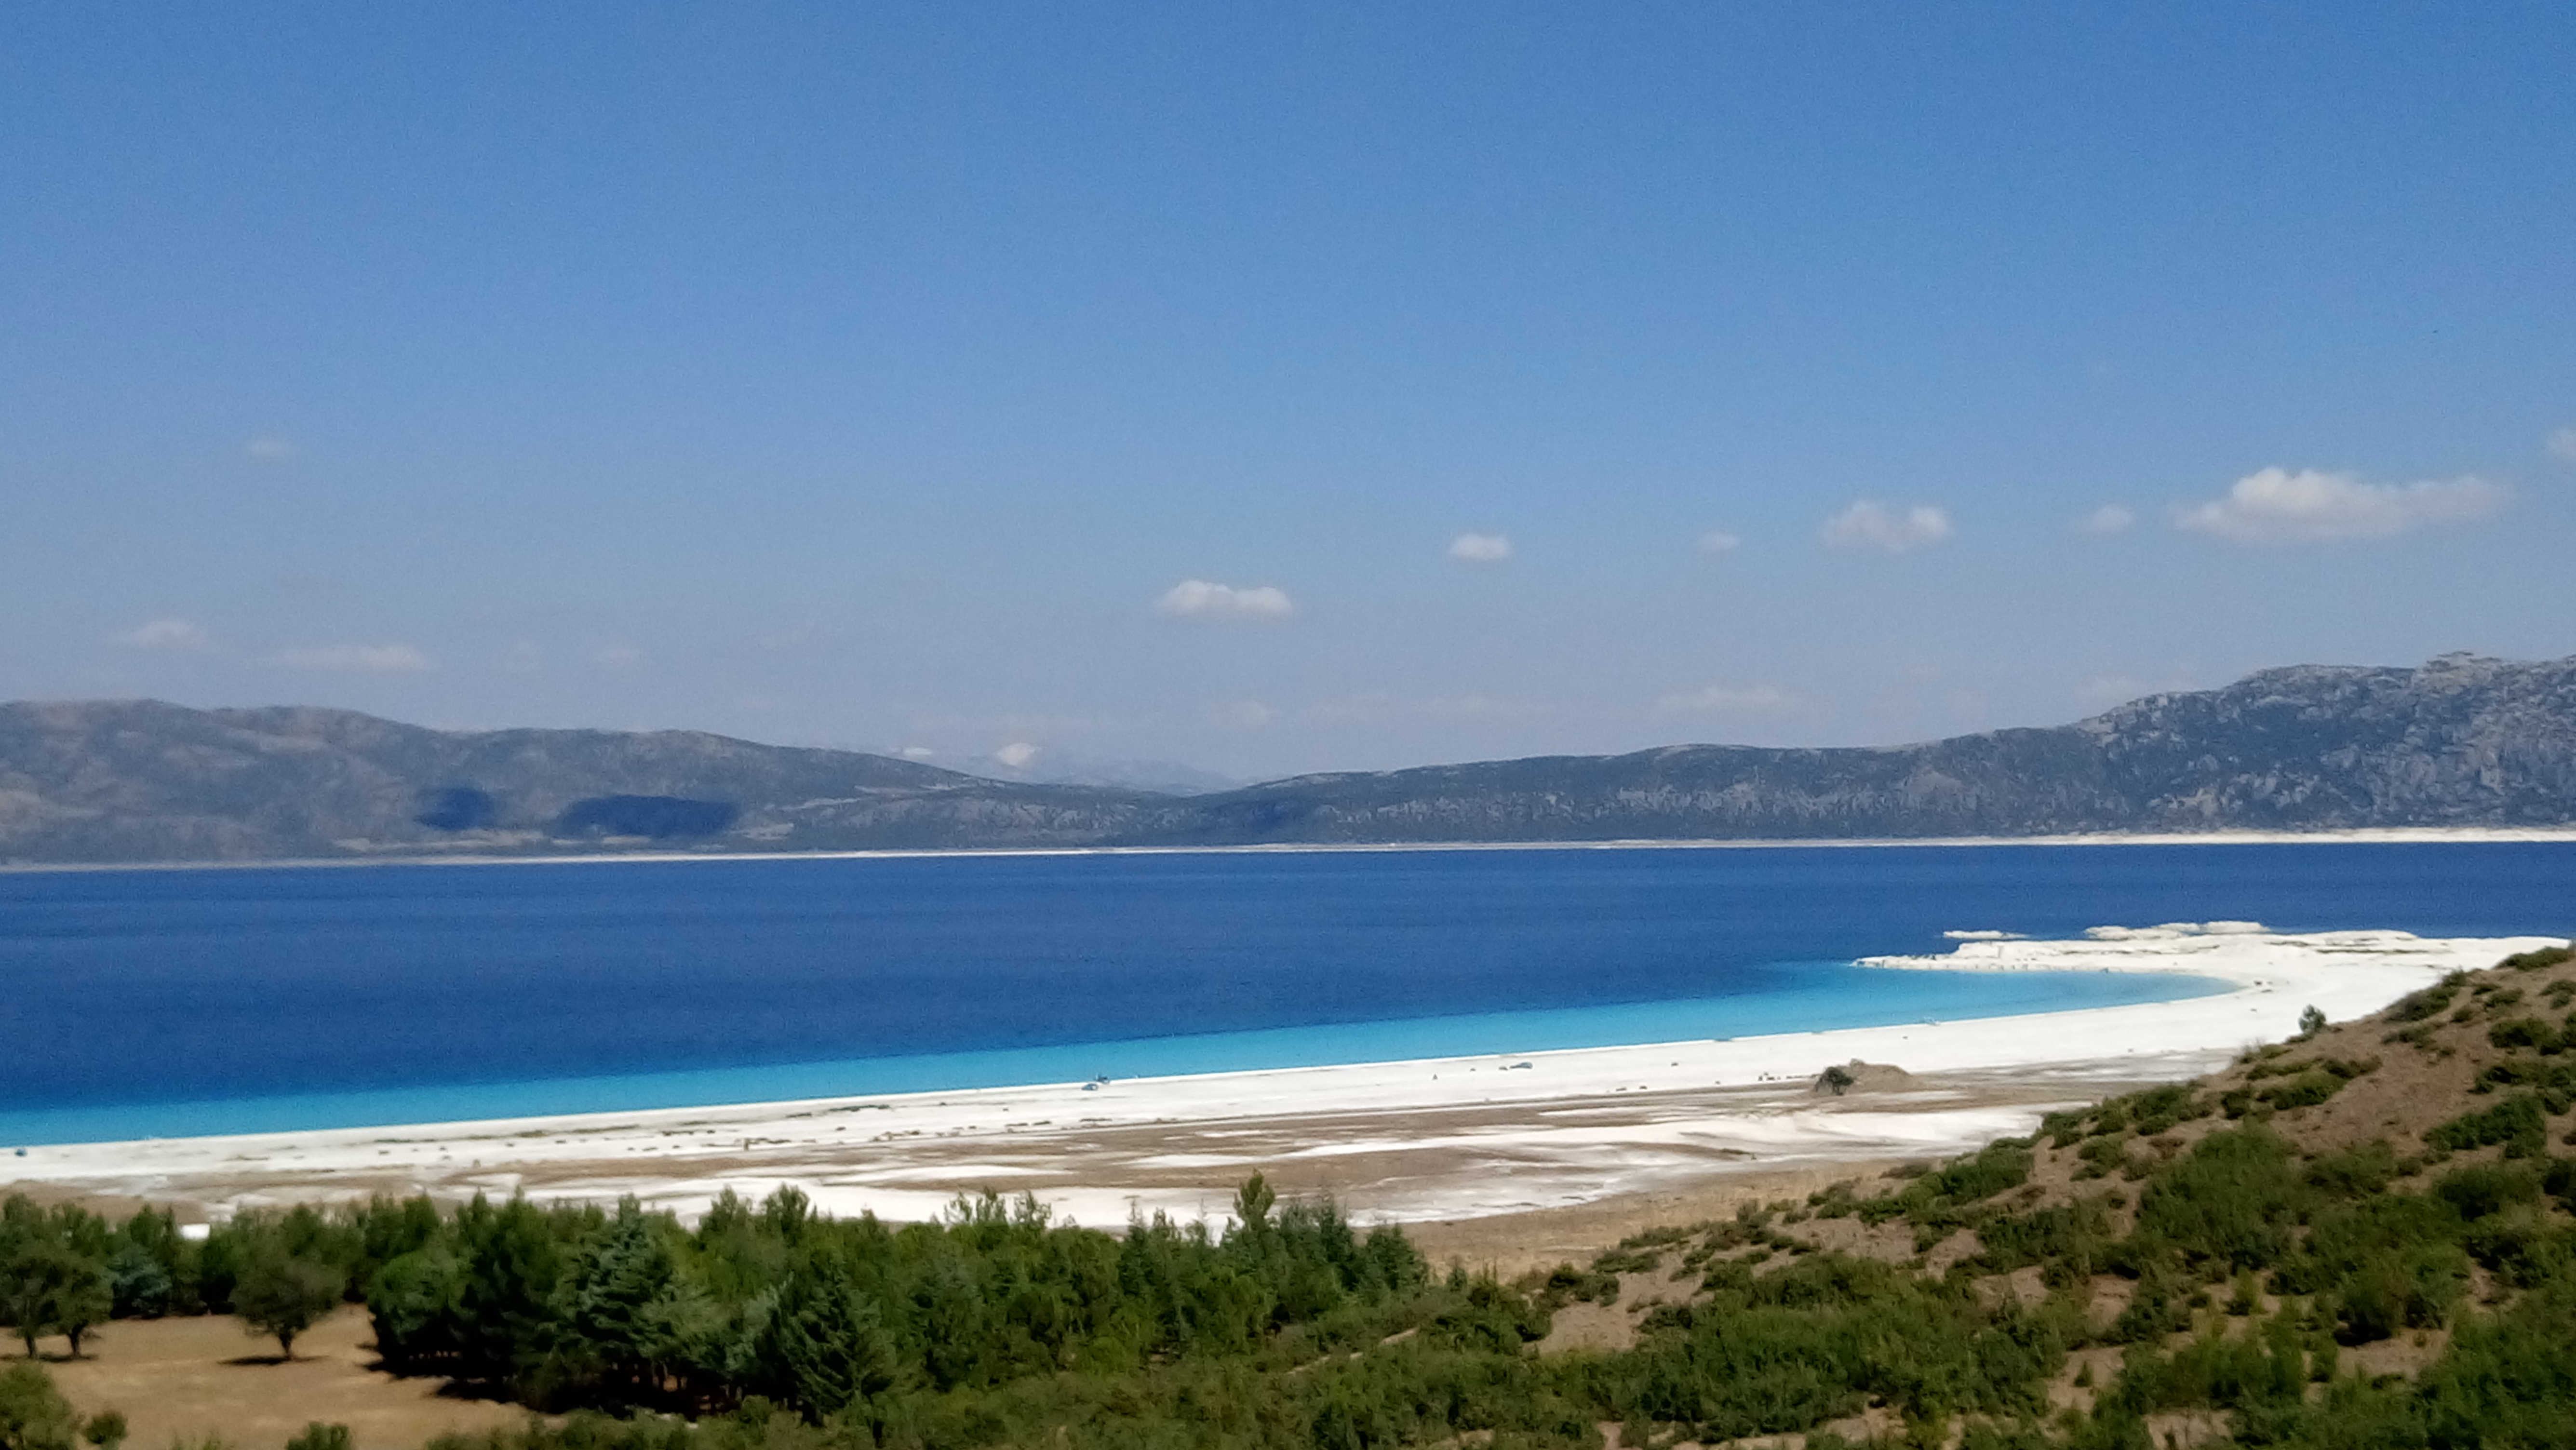 Lake Salda Wikipedia